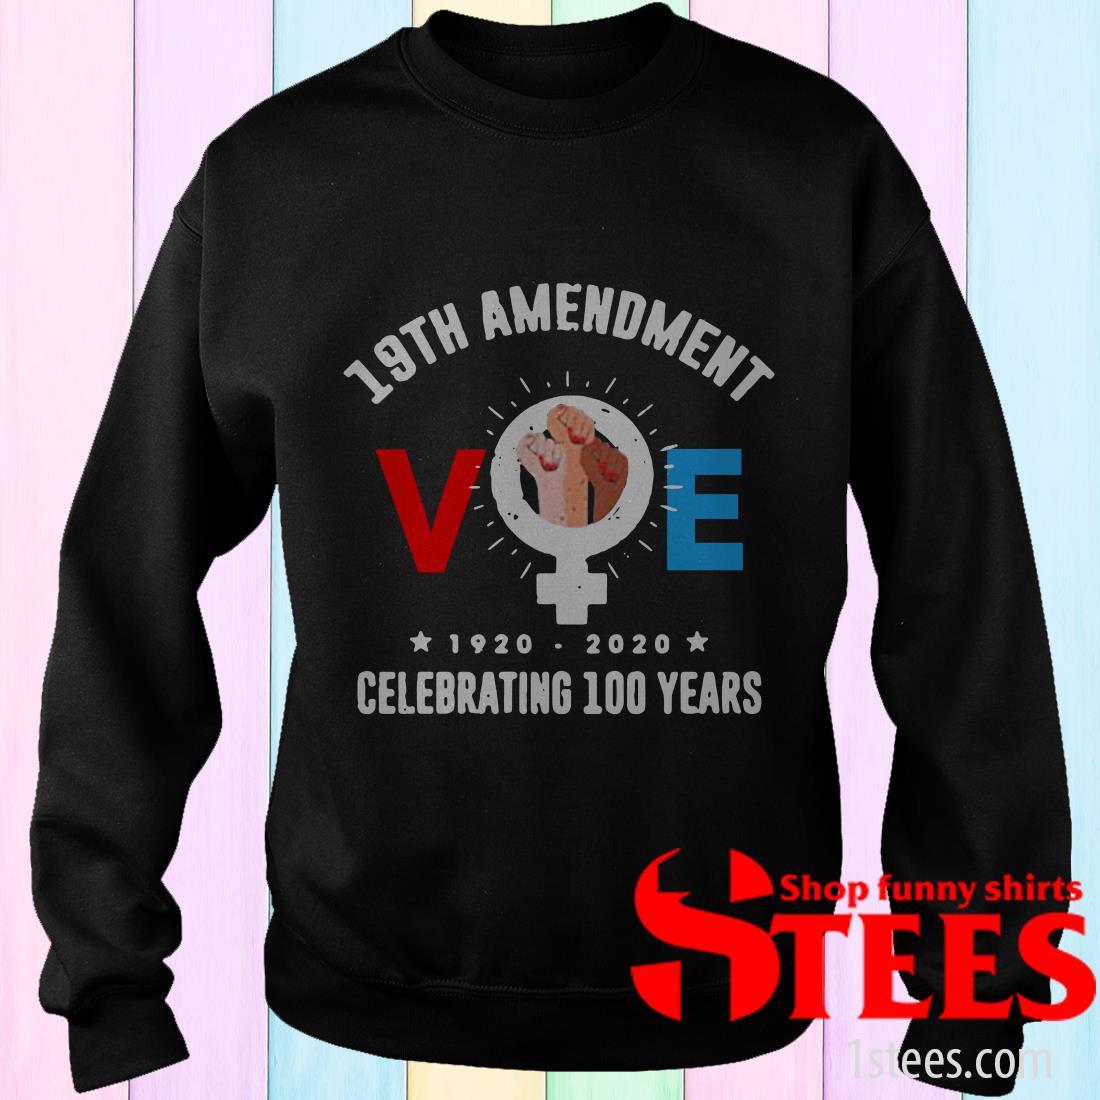 19th Amendment Voe Women Right To Vote Tee Shirt